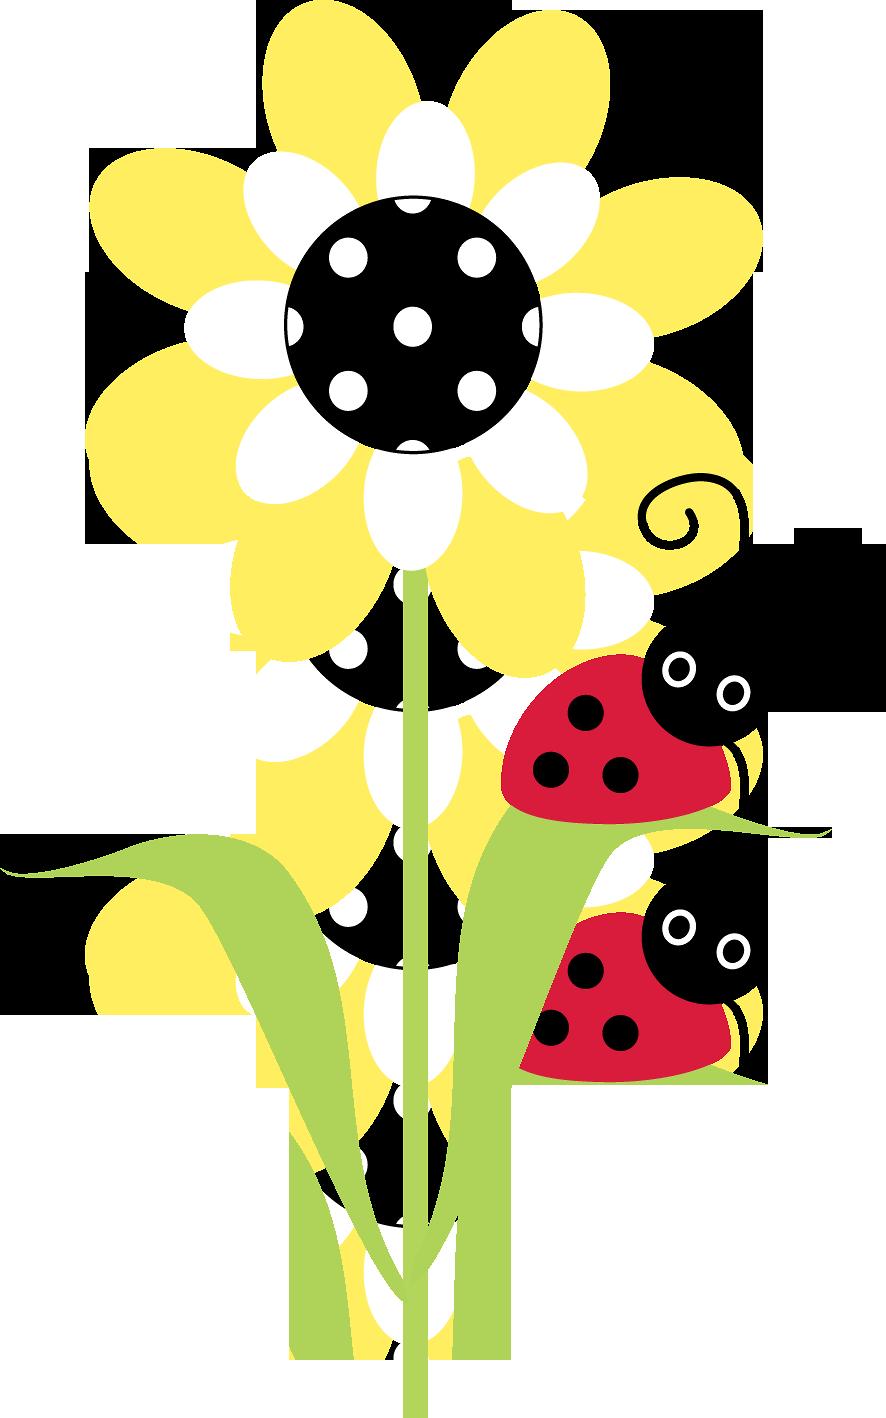 Ladybug clipart friendly. Http daniellemoraesfalcao minus com